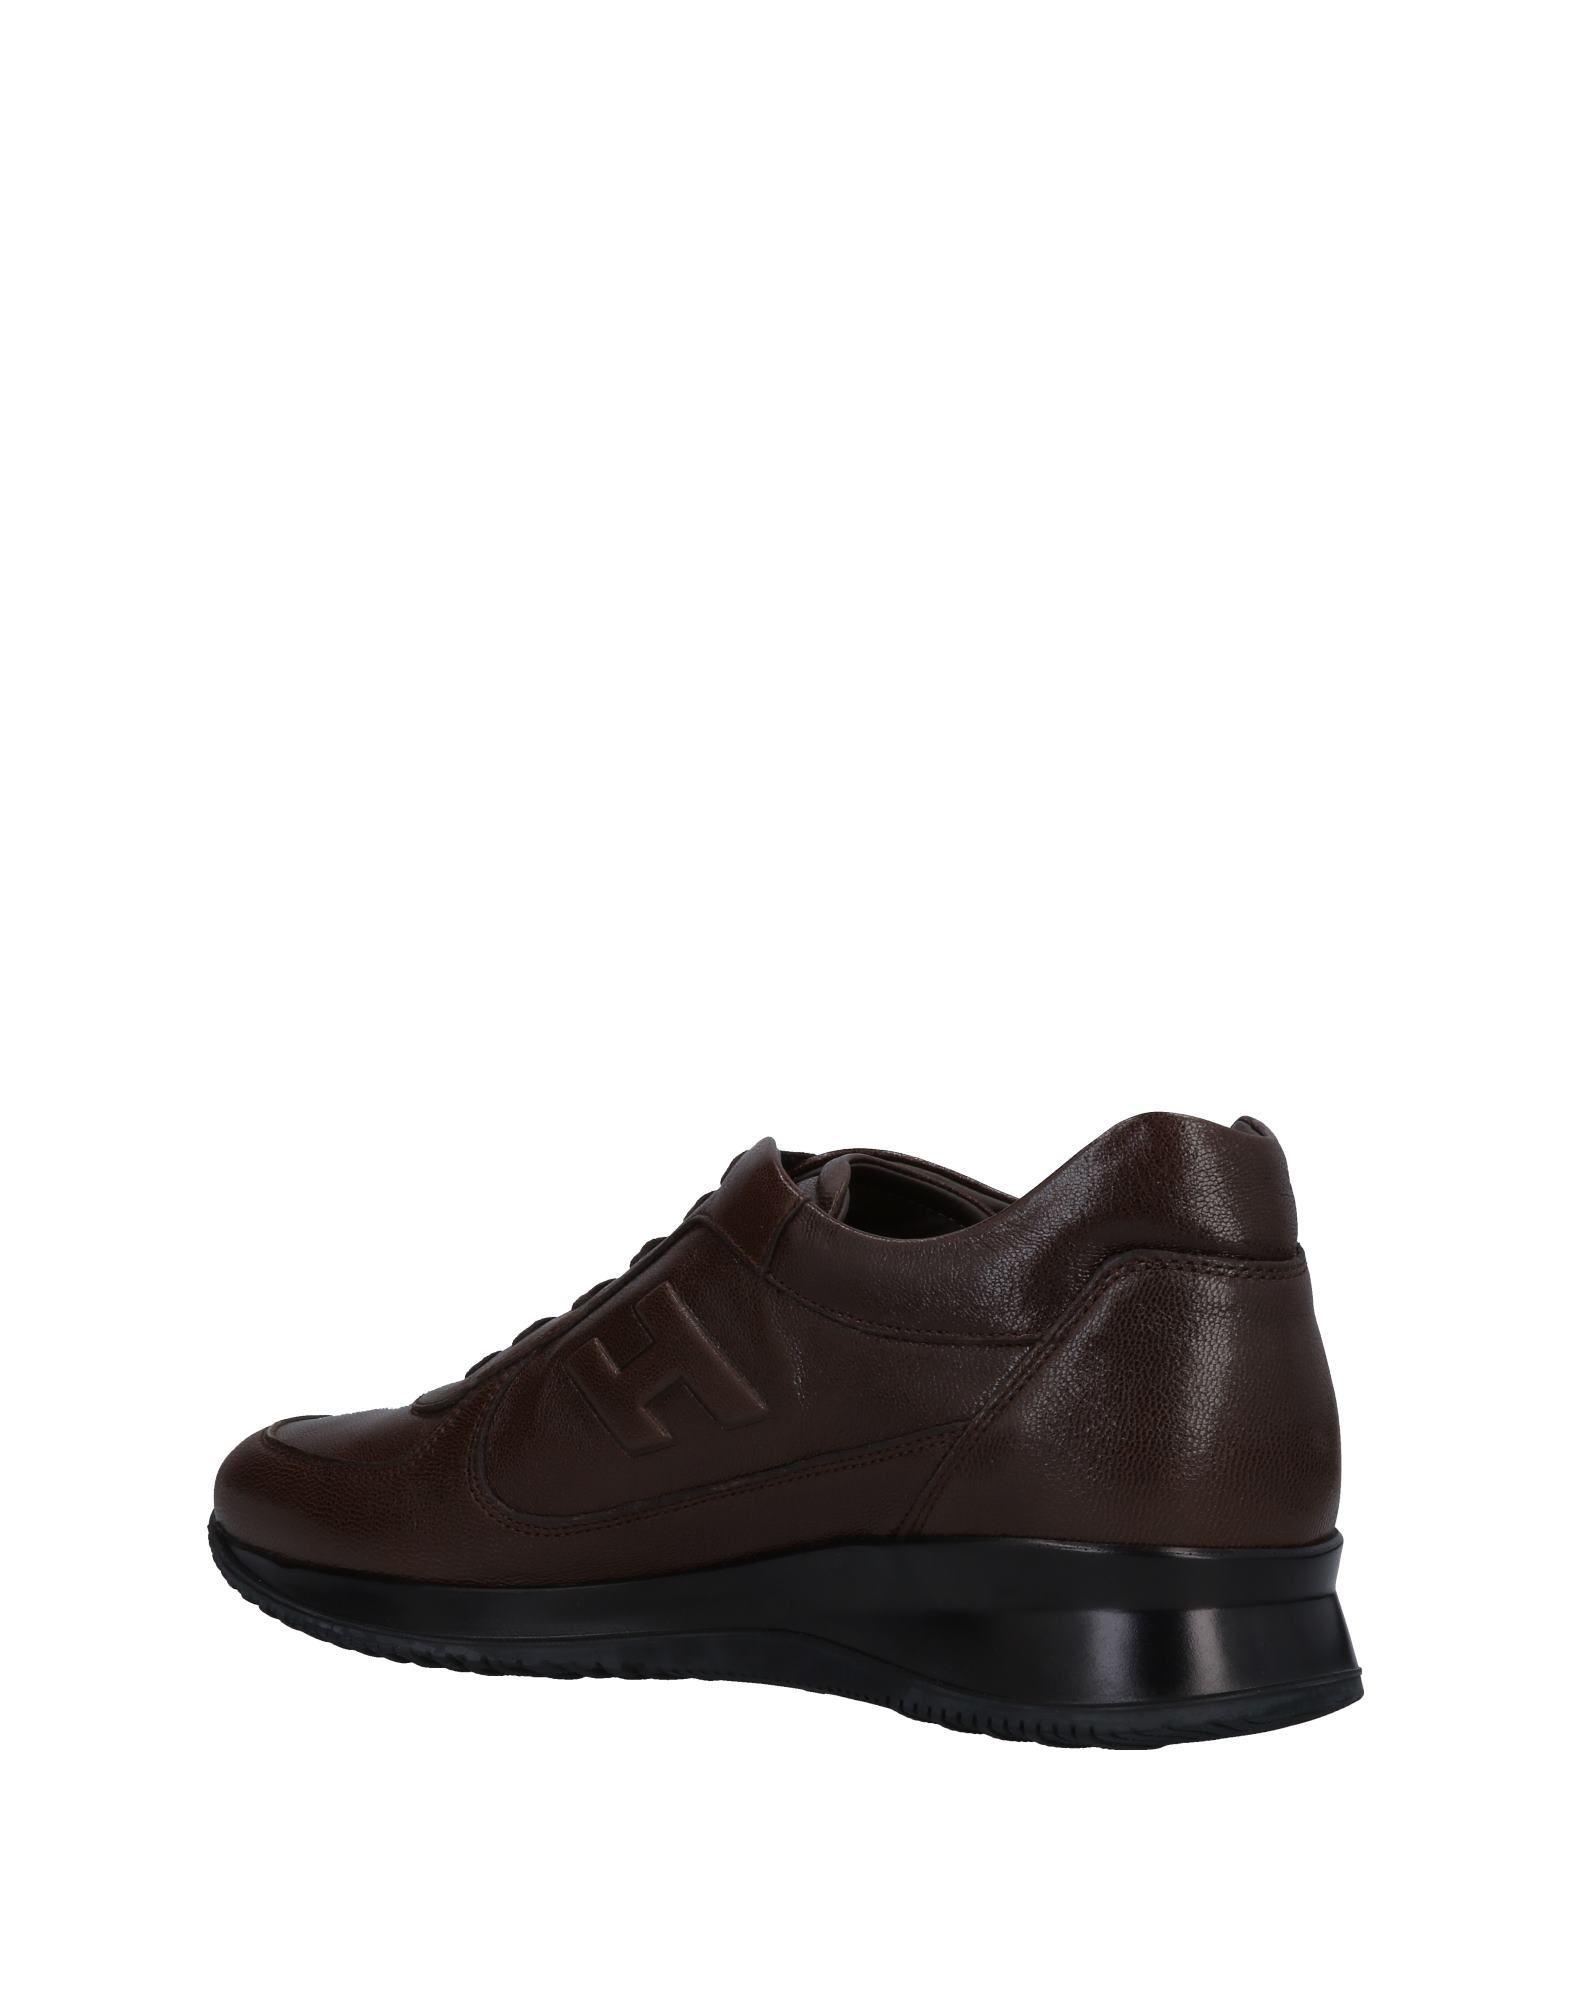 FOOTWEAR Hogan Cocoa Man Leather